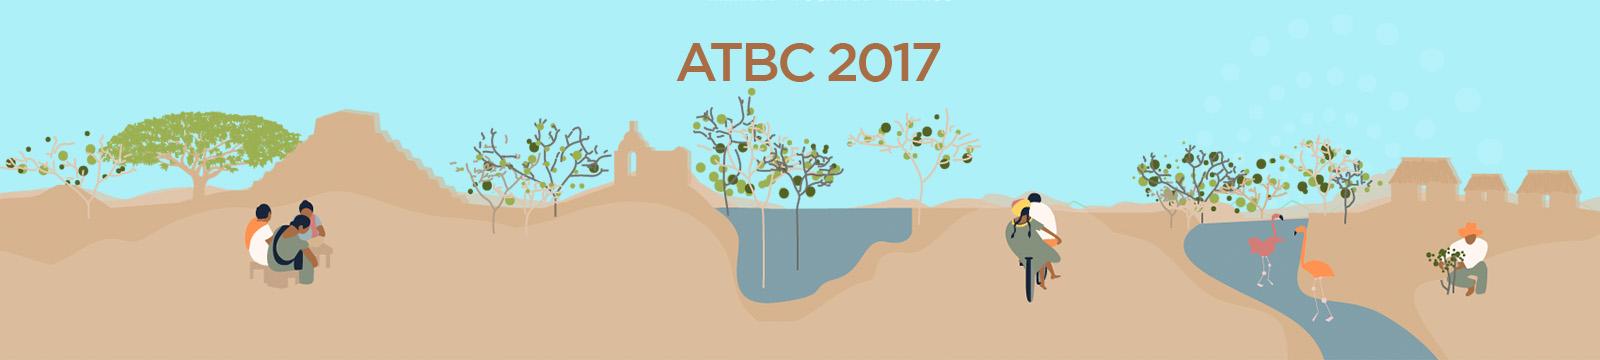 2016_Jul_Banner ATBC 2017